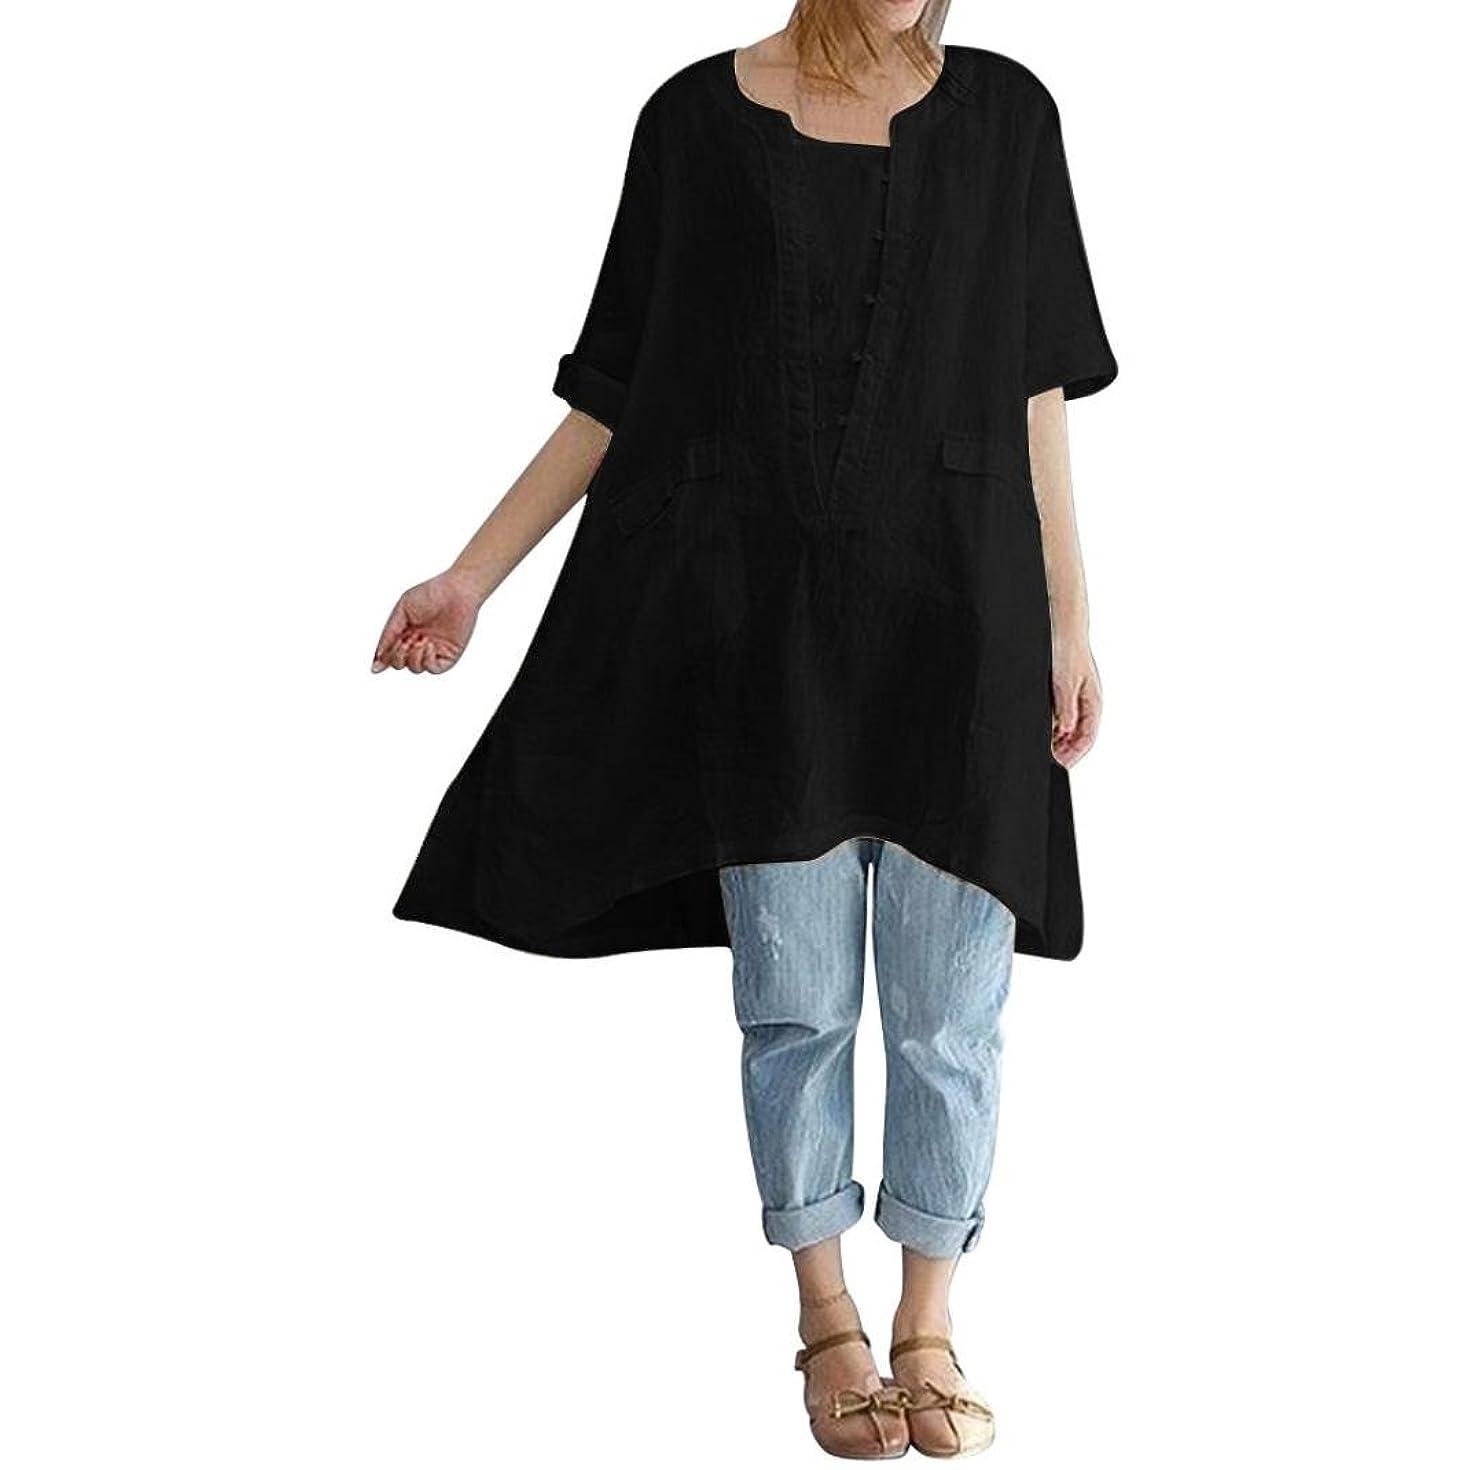 Women Ladies Plus Size Oversized Long Sleeve Cotton Linen Blouse Tunic Tops Shirt Dress